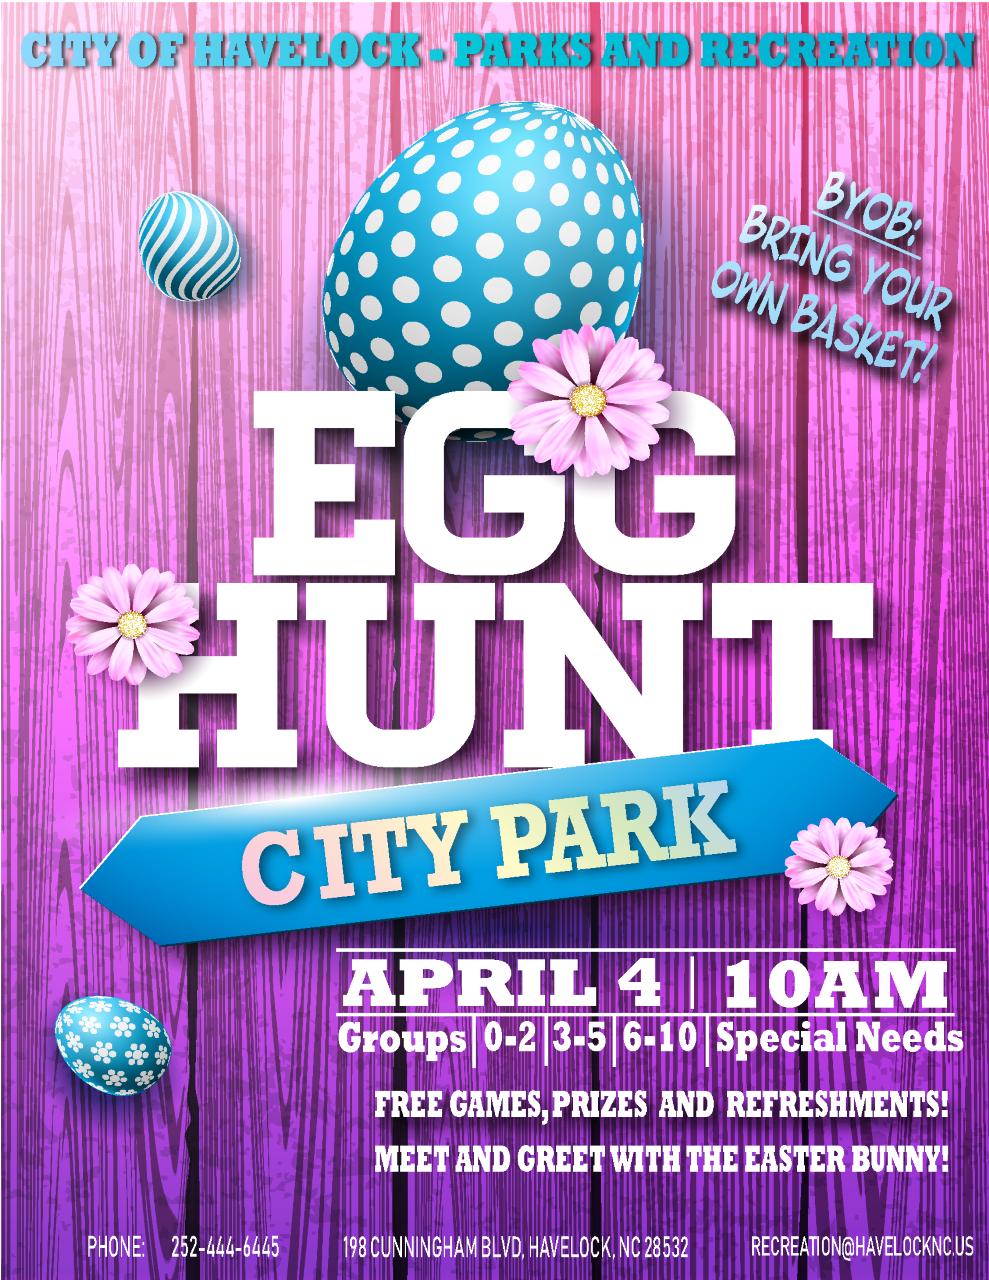 City Of Havelock Easter Egg Hunt